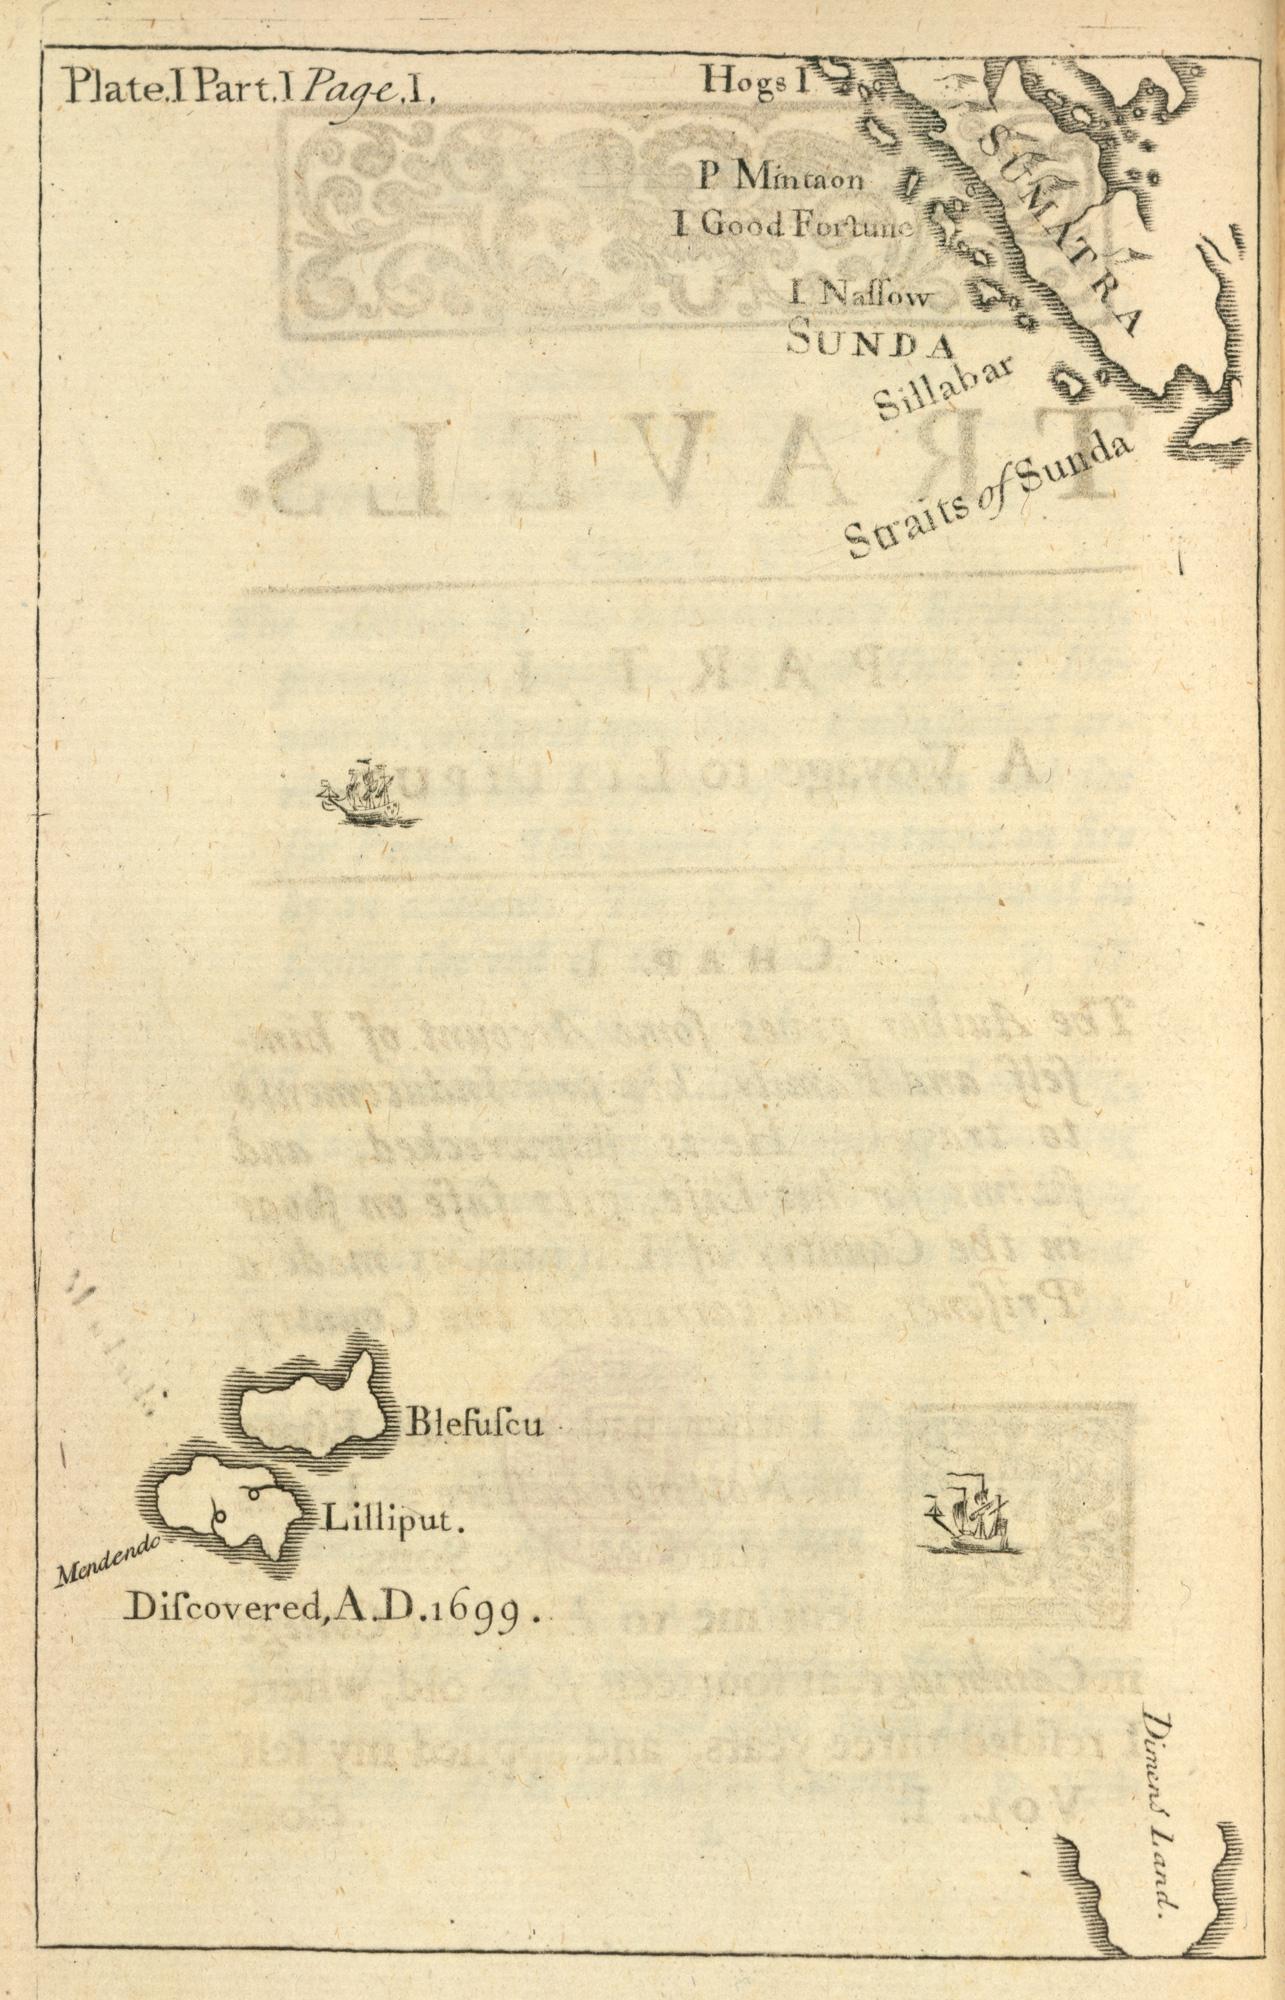 Map of Lilliput and Blefuscu (12612.f.10.)